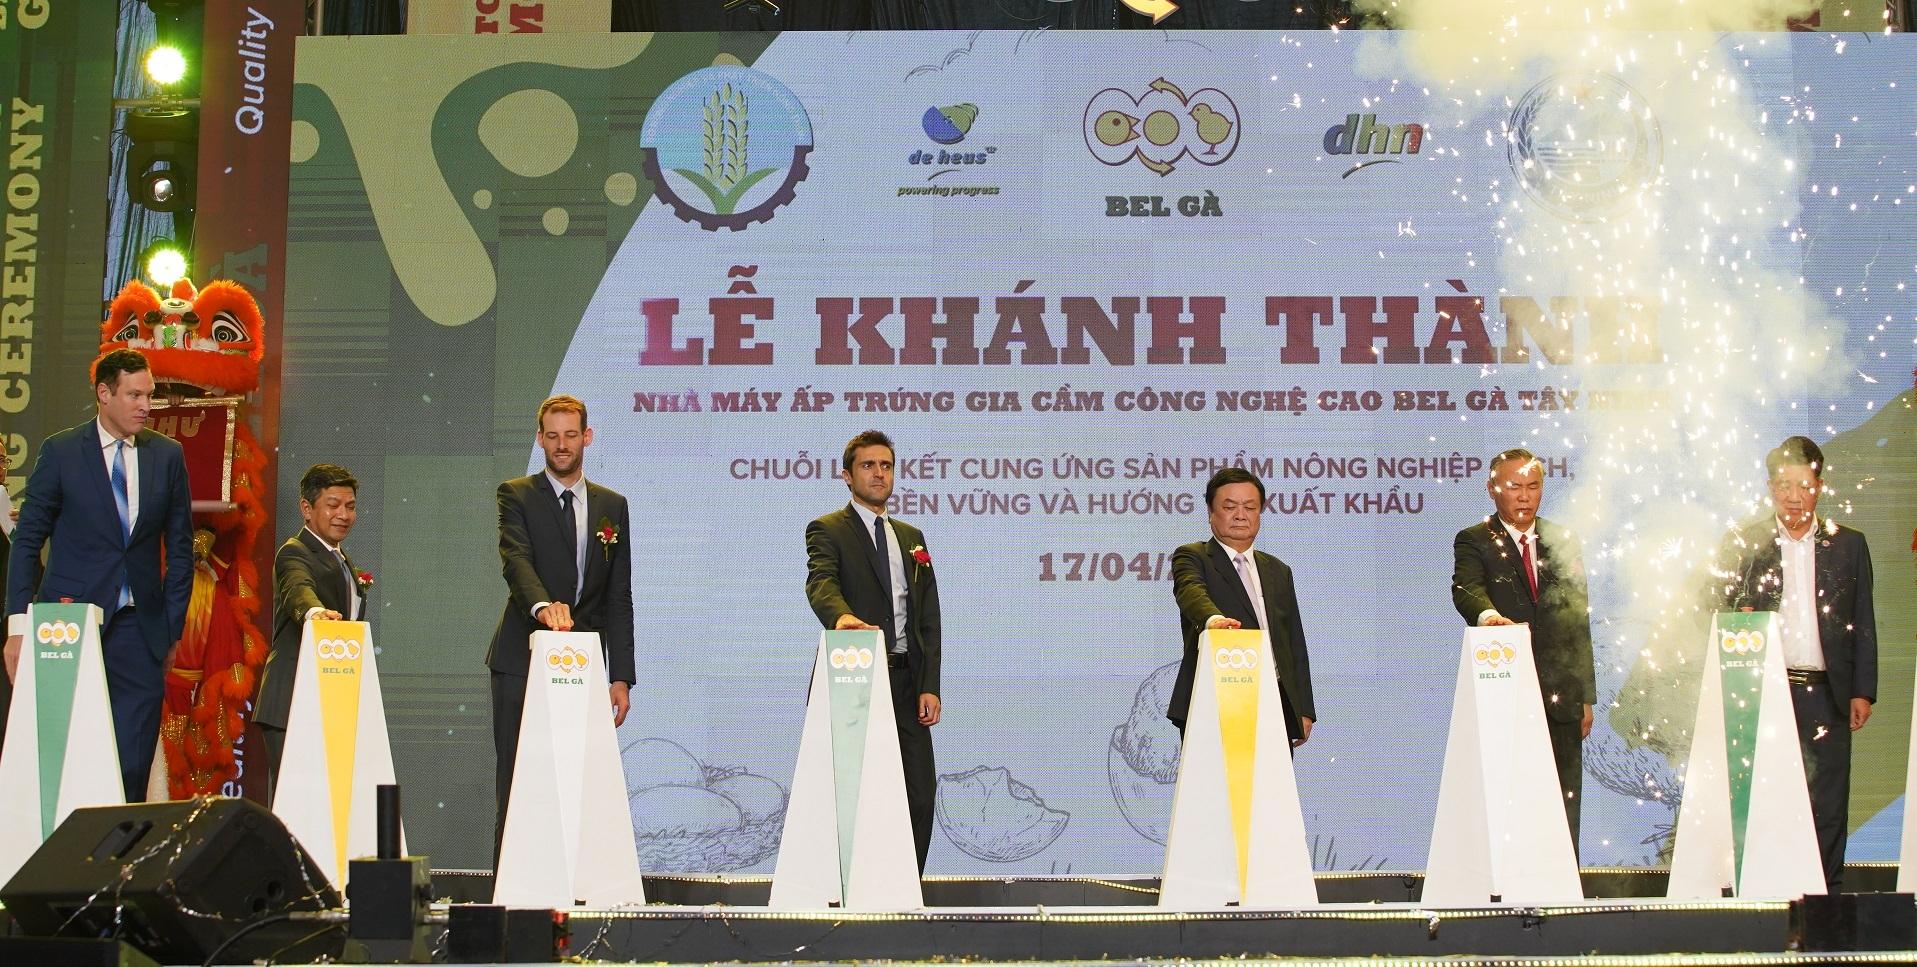 Bel Ga holds grand opening for Tay Ninh high-tech hatchery